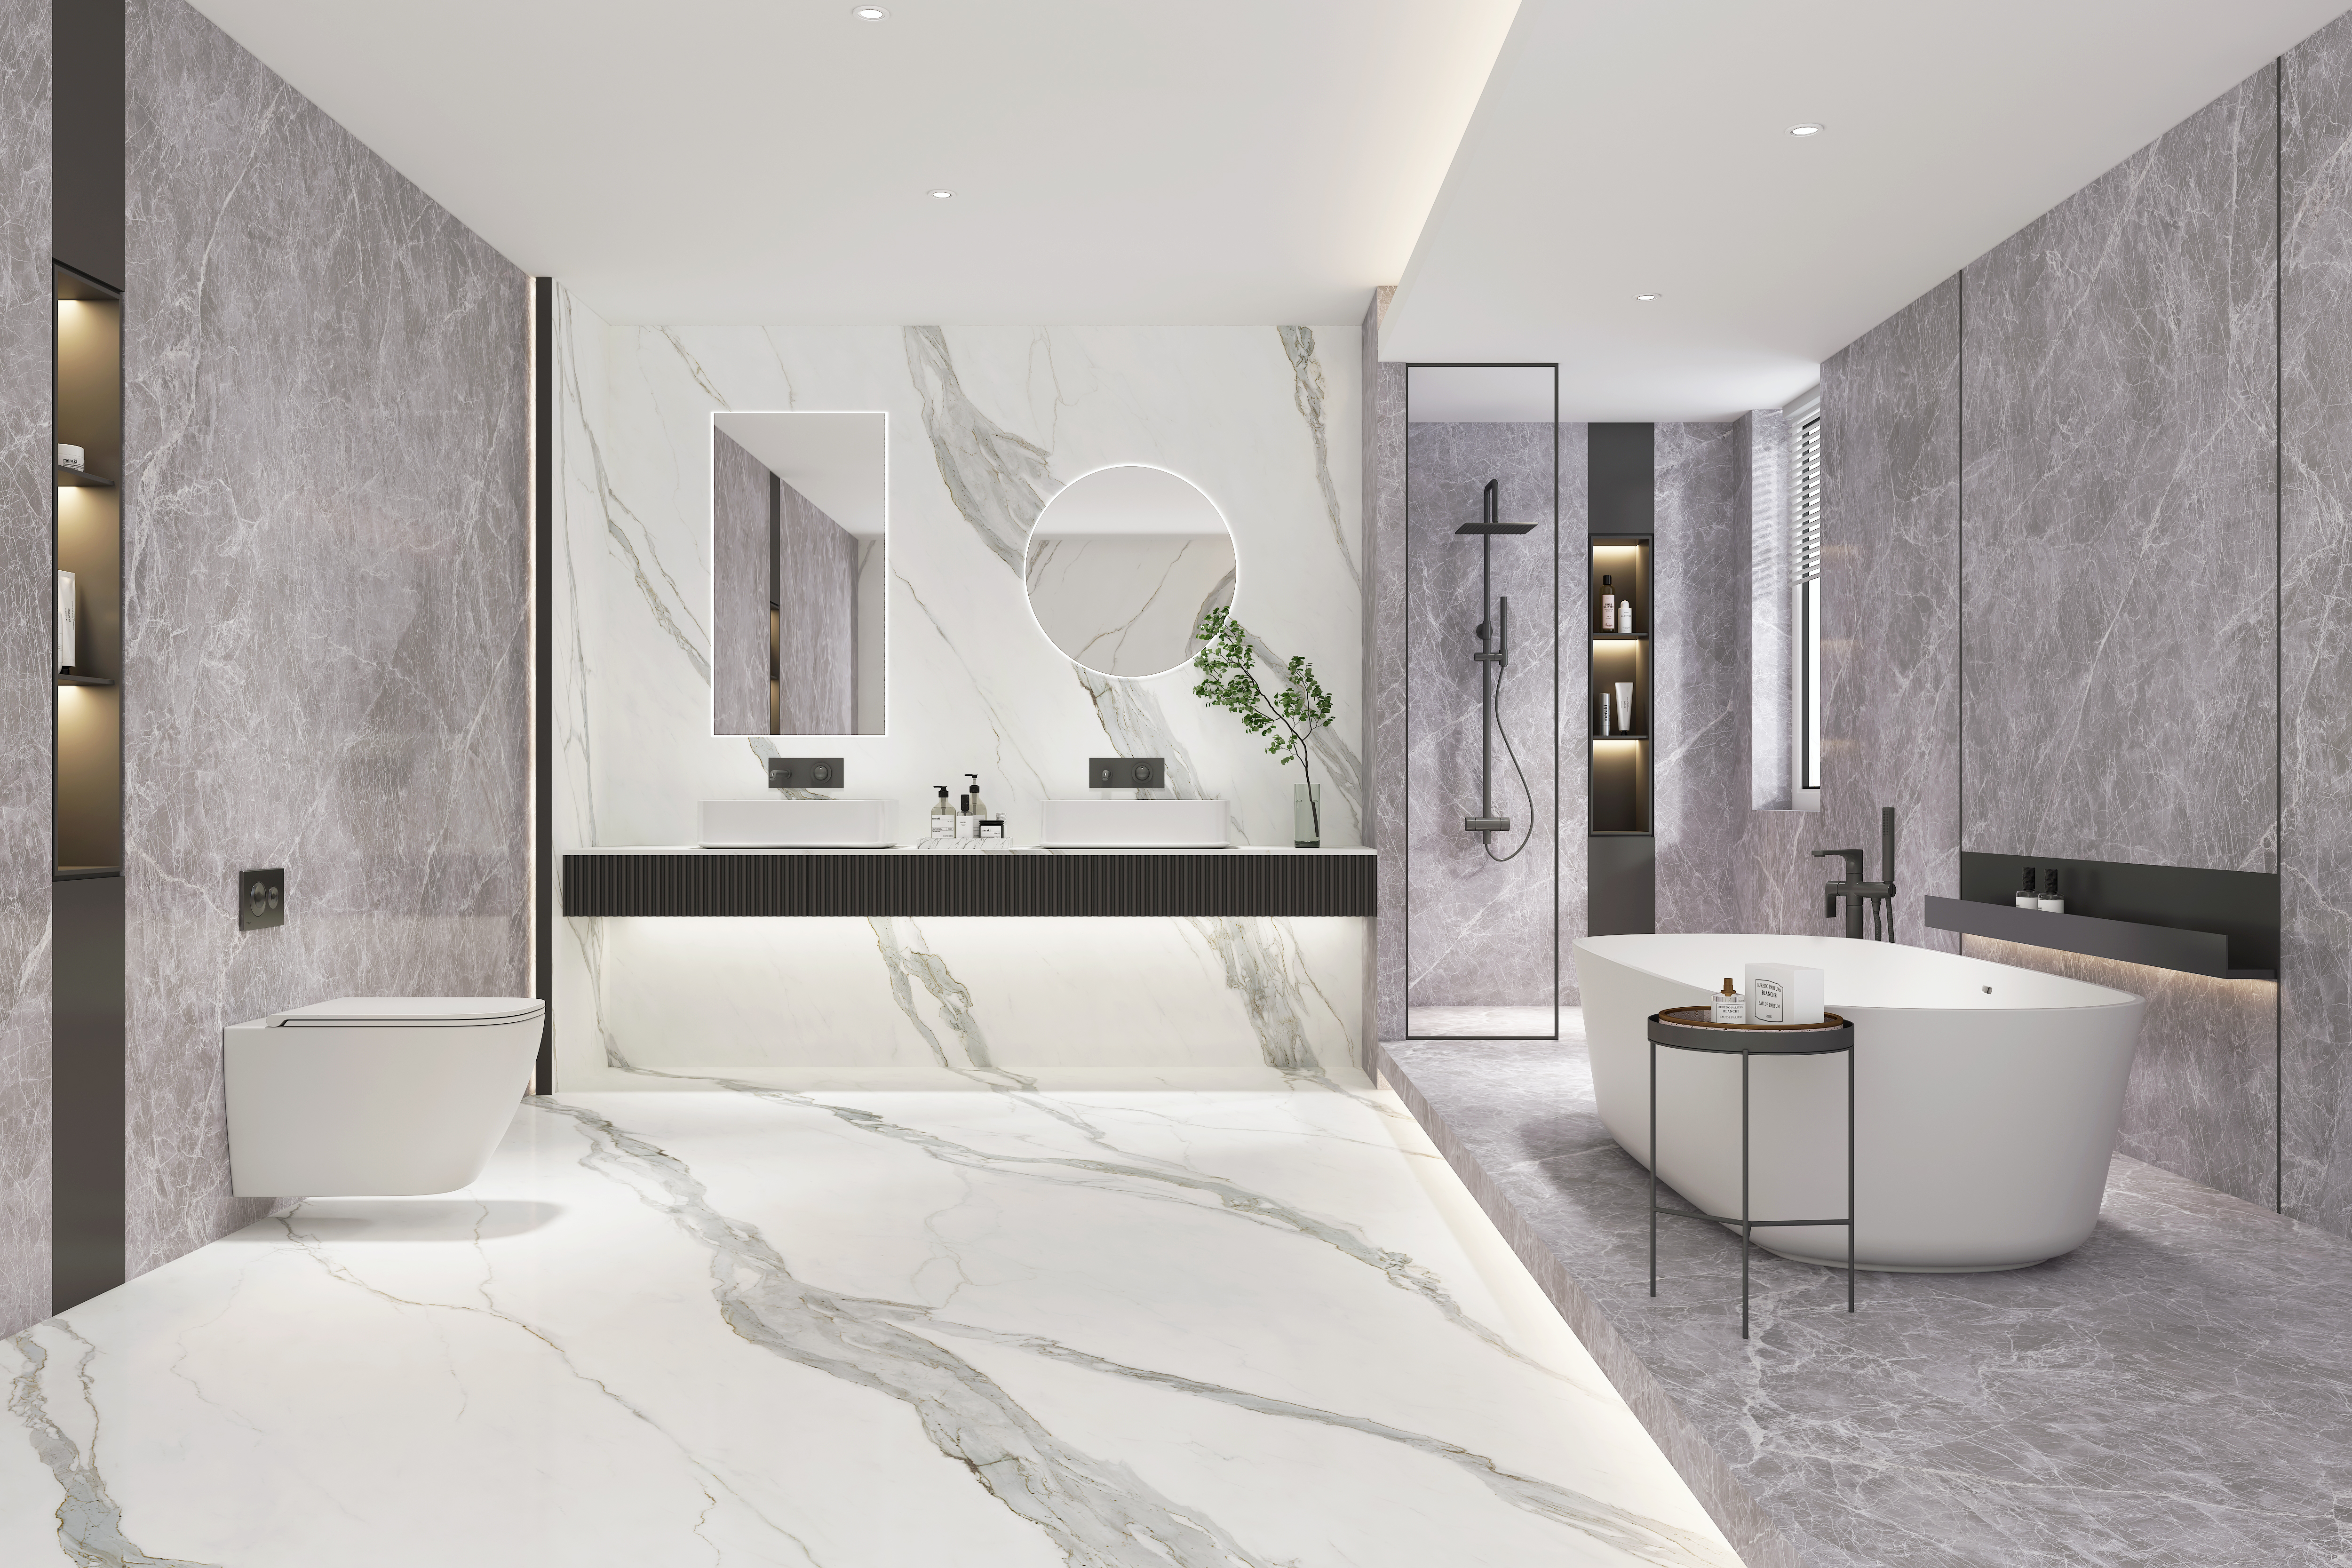 Bianco Venato Marble Tiles Manufacturers, Bianco Venato Marble Tiles Factory, Supply Bianco Venato Marble Tiles